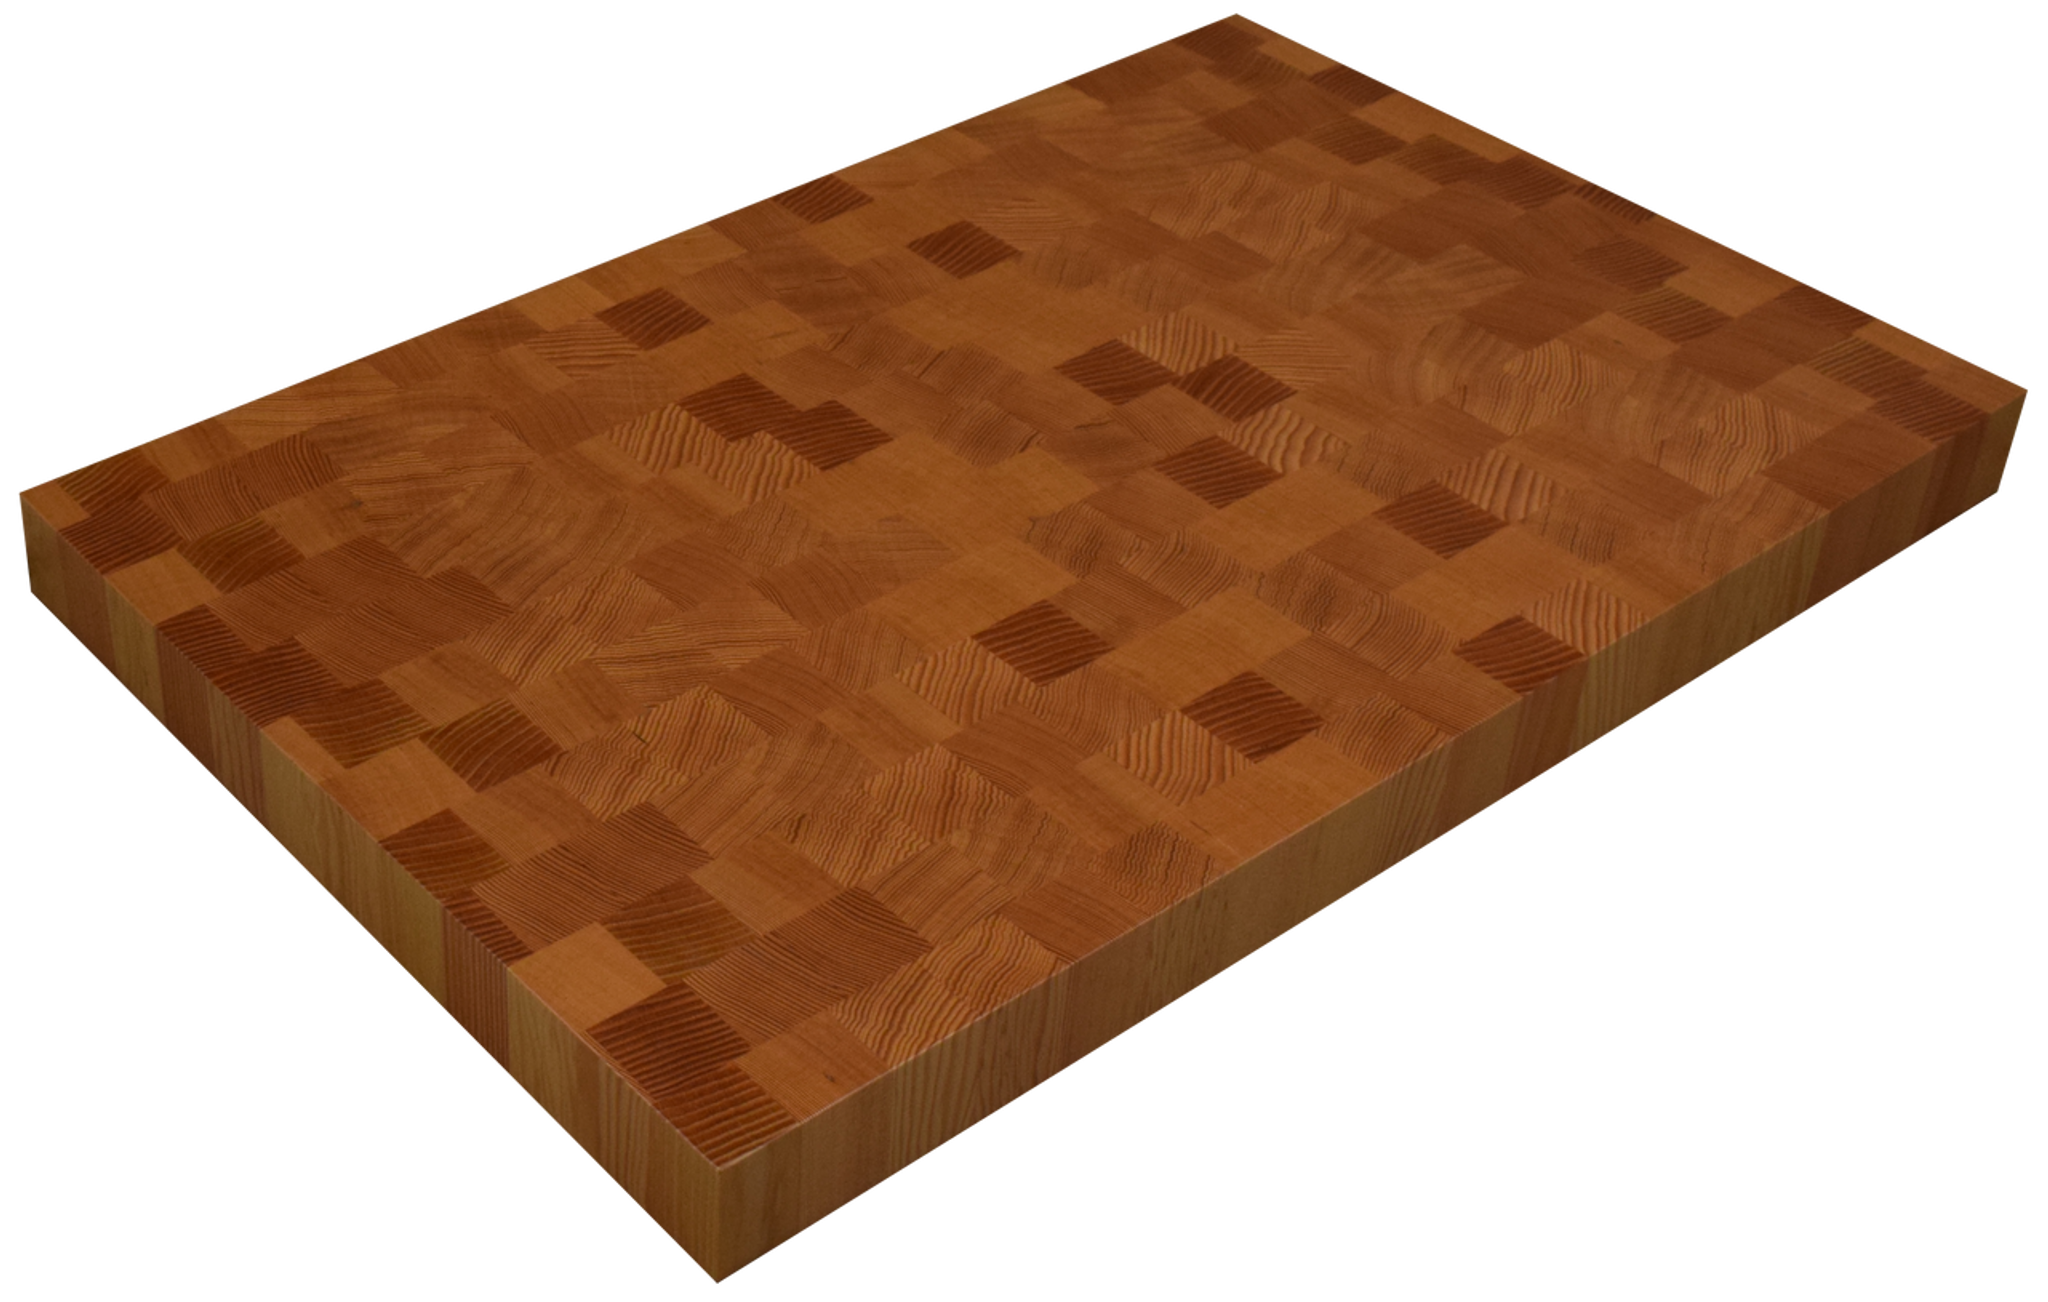 douglas fir end grain butcher block countertop hardwood lumber company. Black Bedroom Furniture Sets. Home Design Ideas